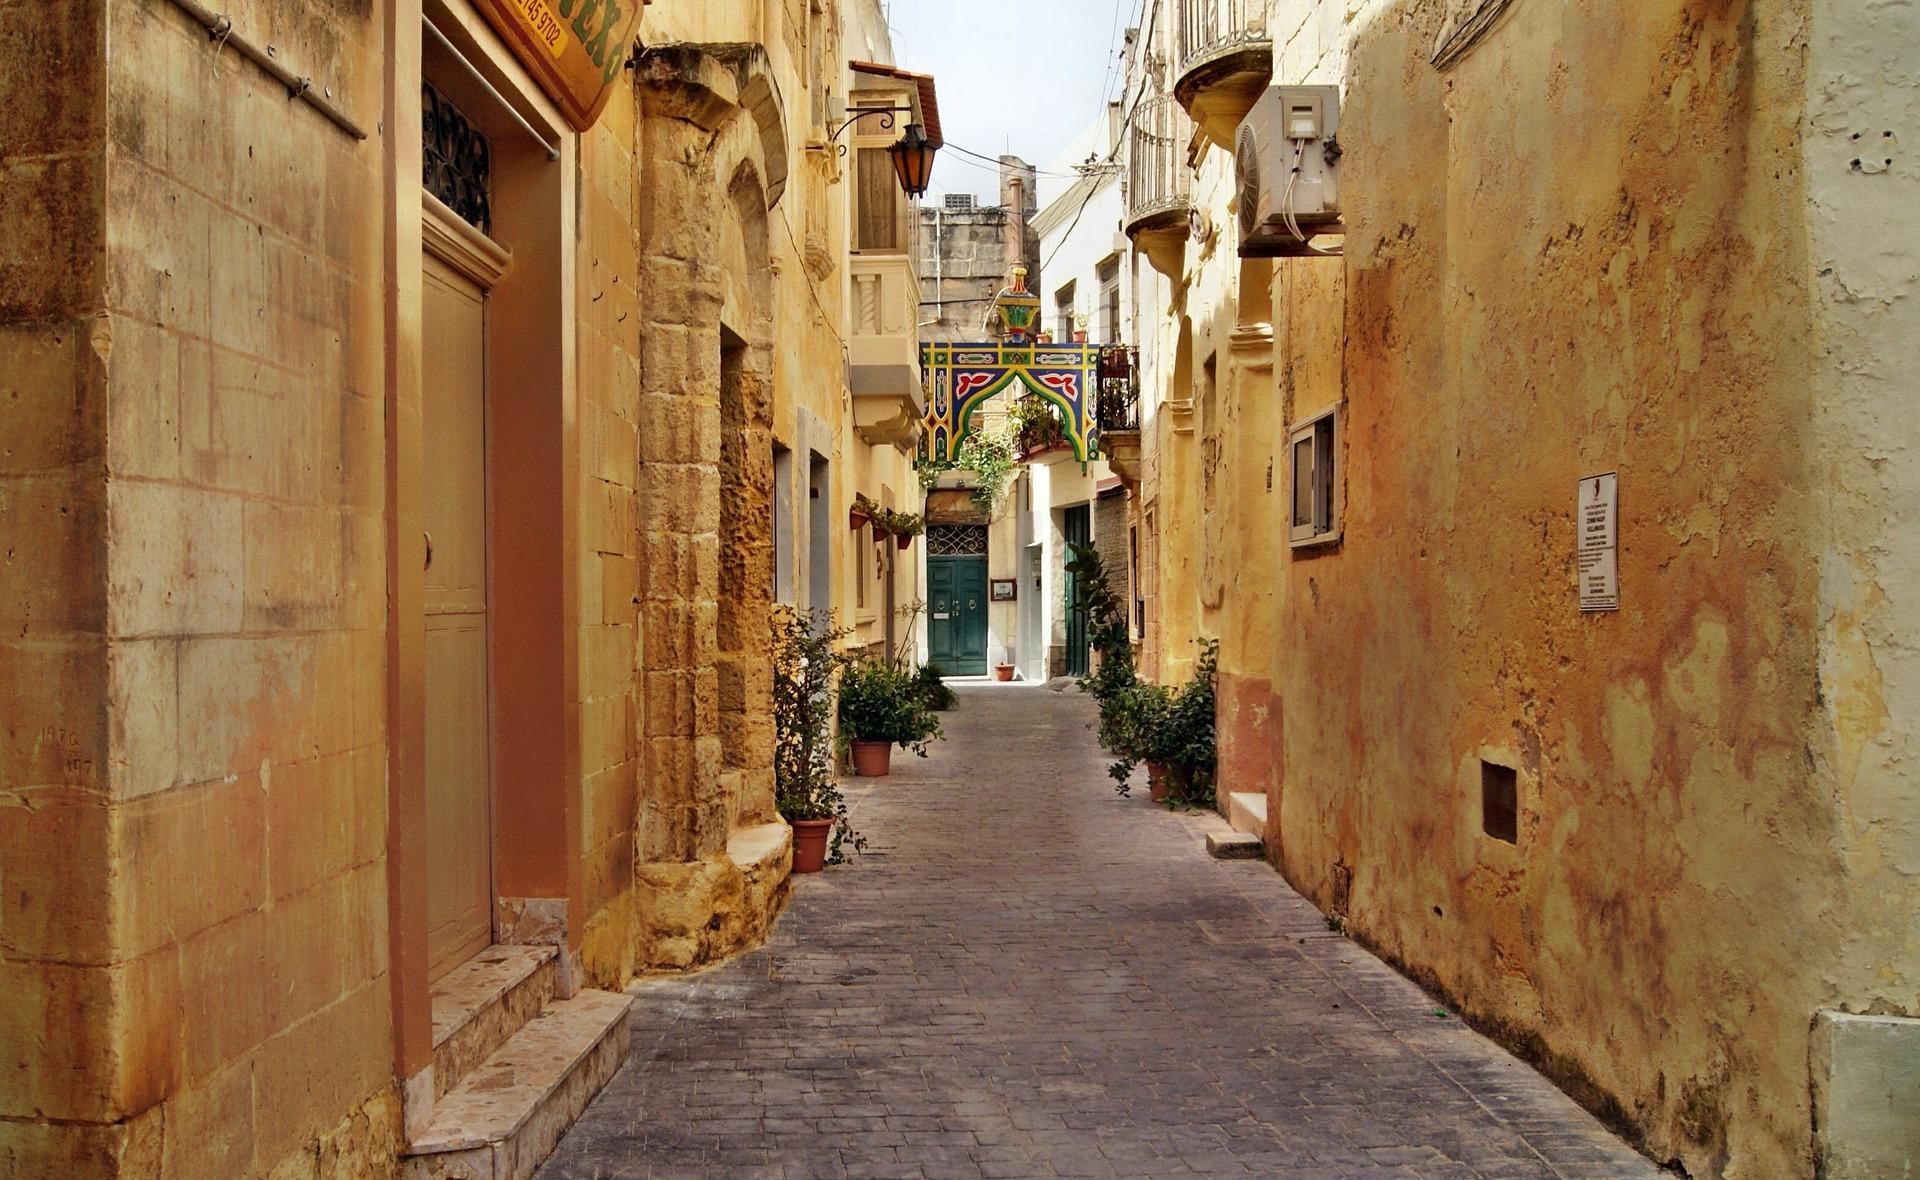 Lane in Valletta, Malta